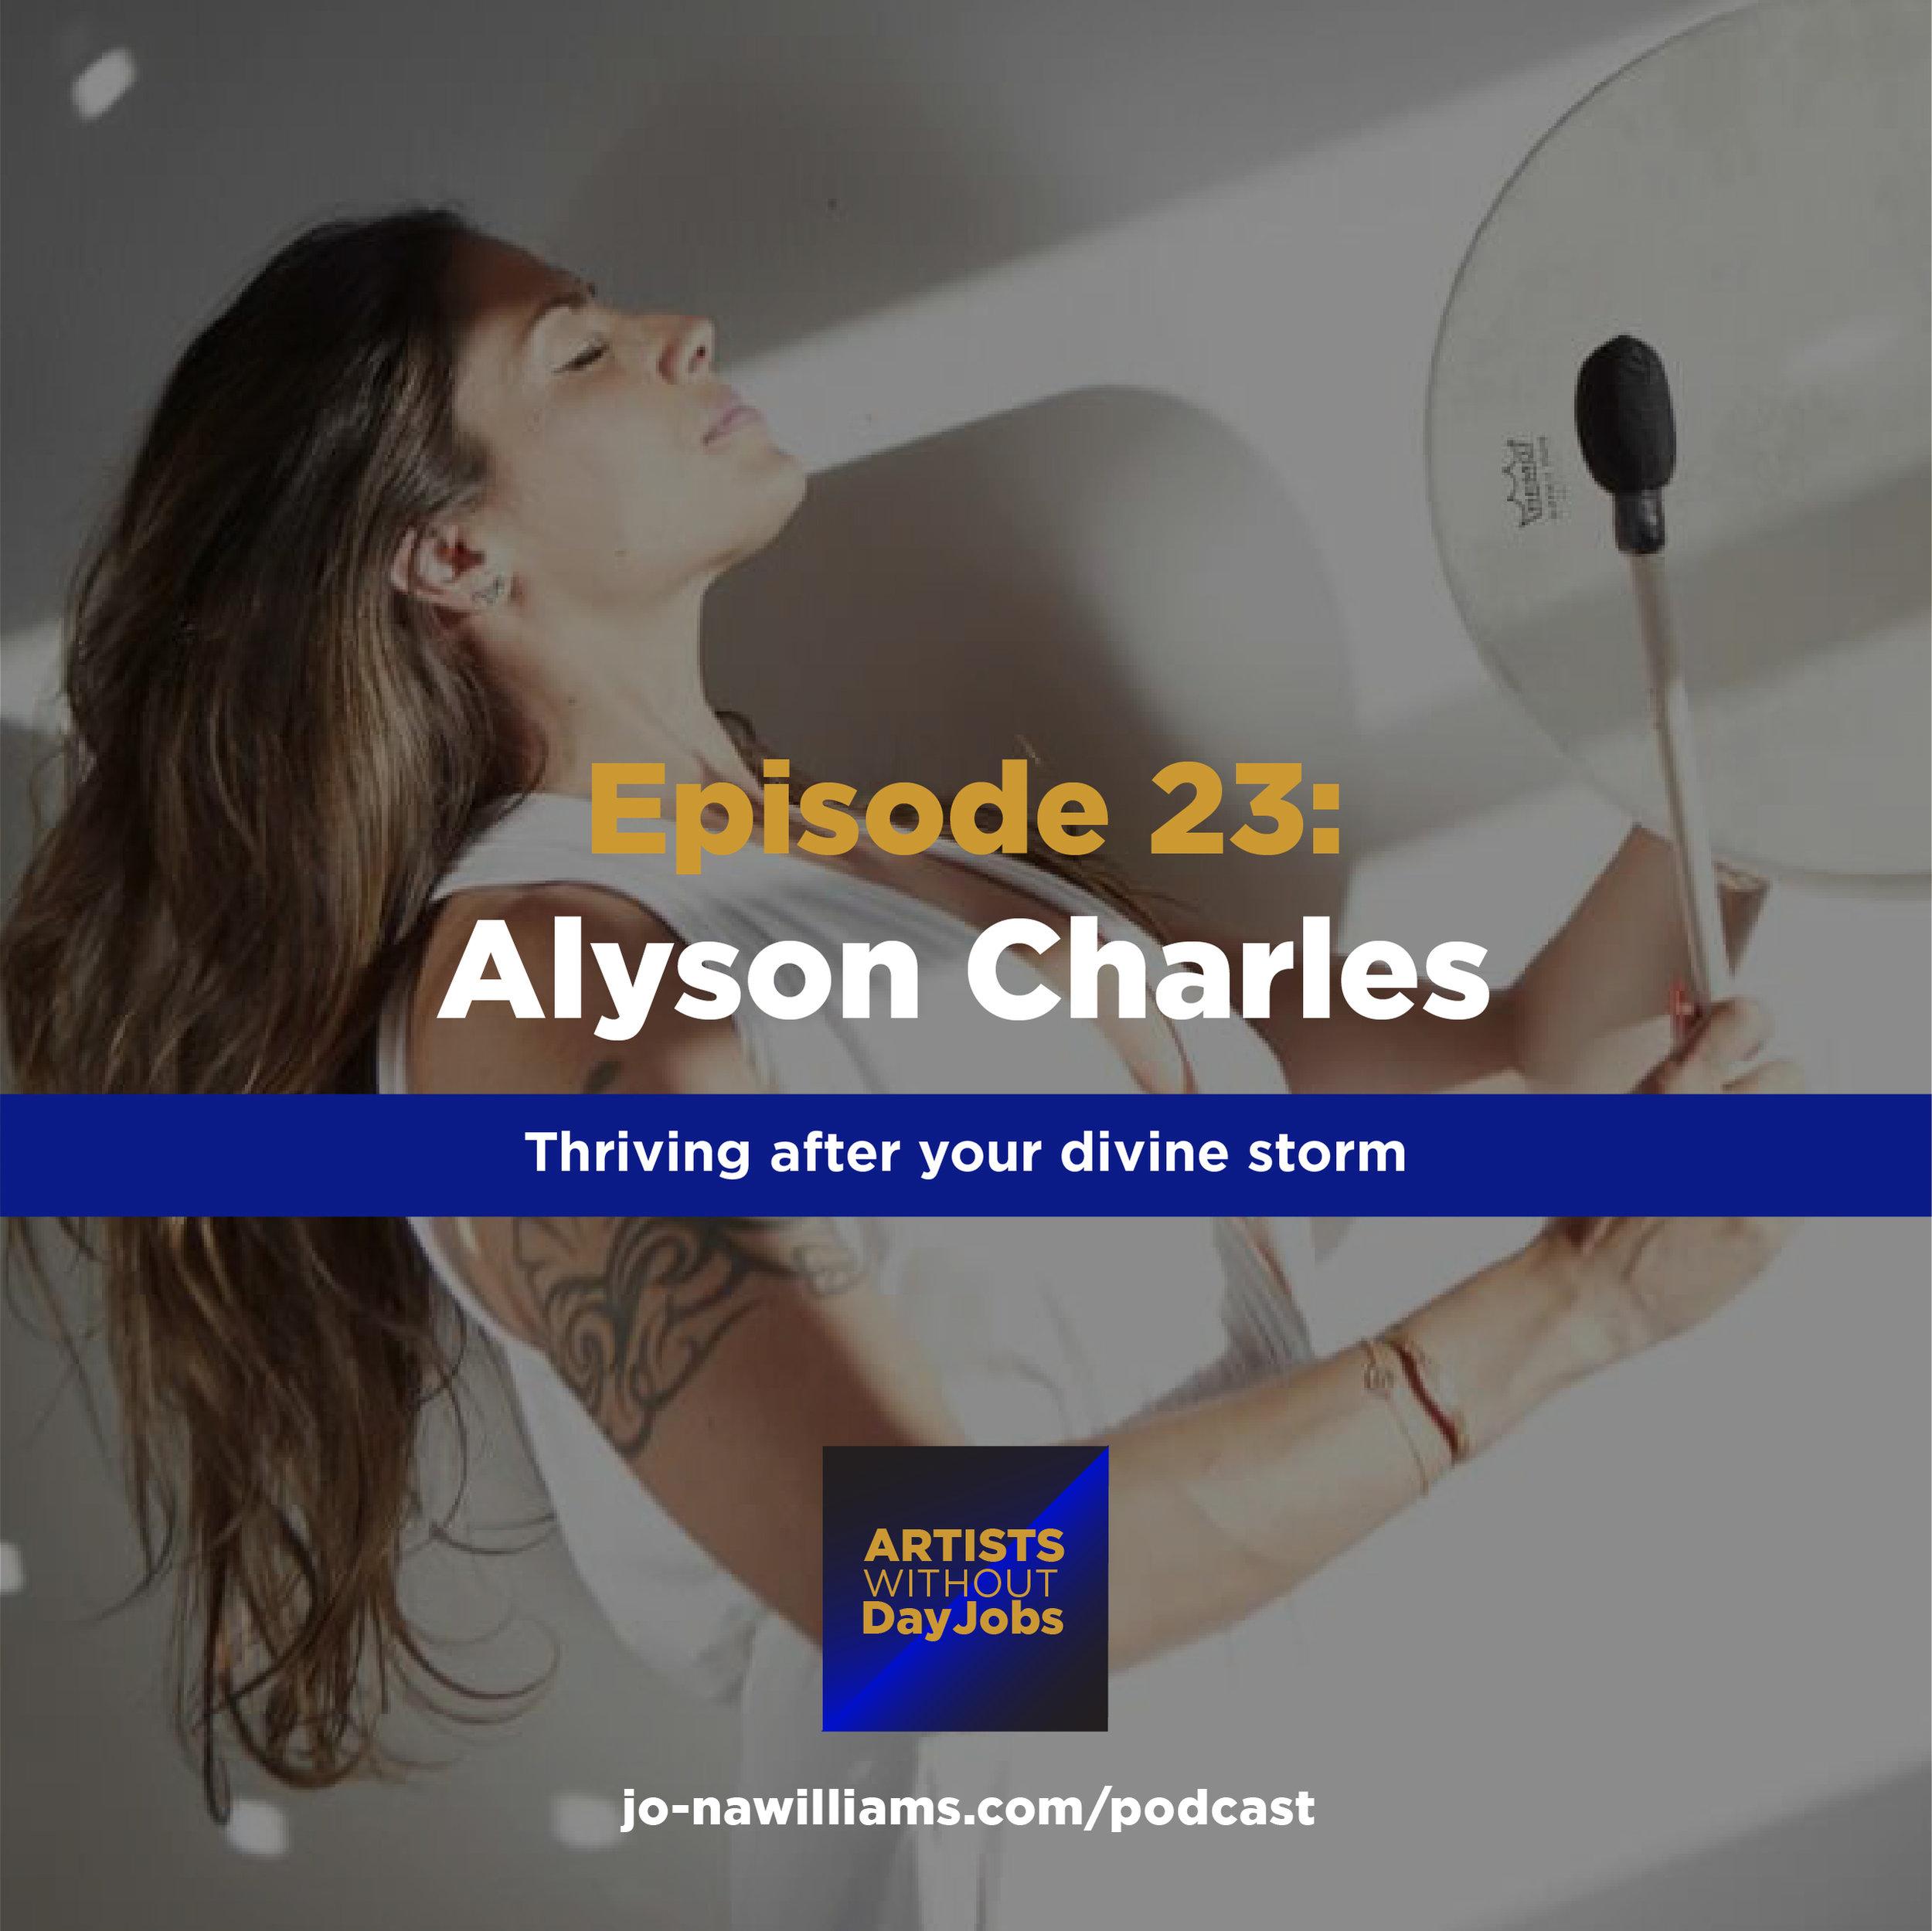 Alyson_Episode 23_template-01 (1).jpg